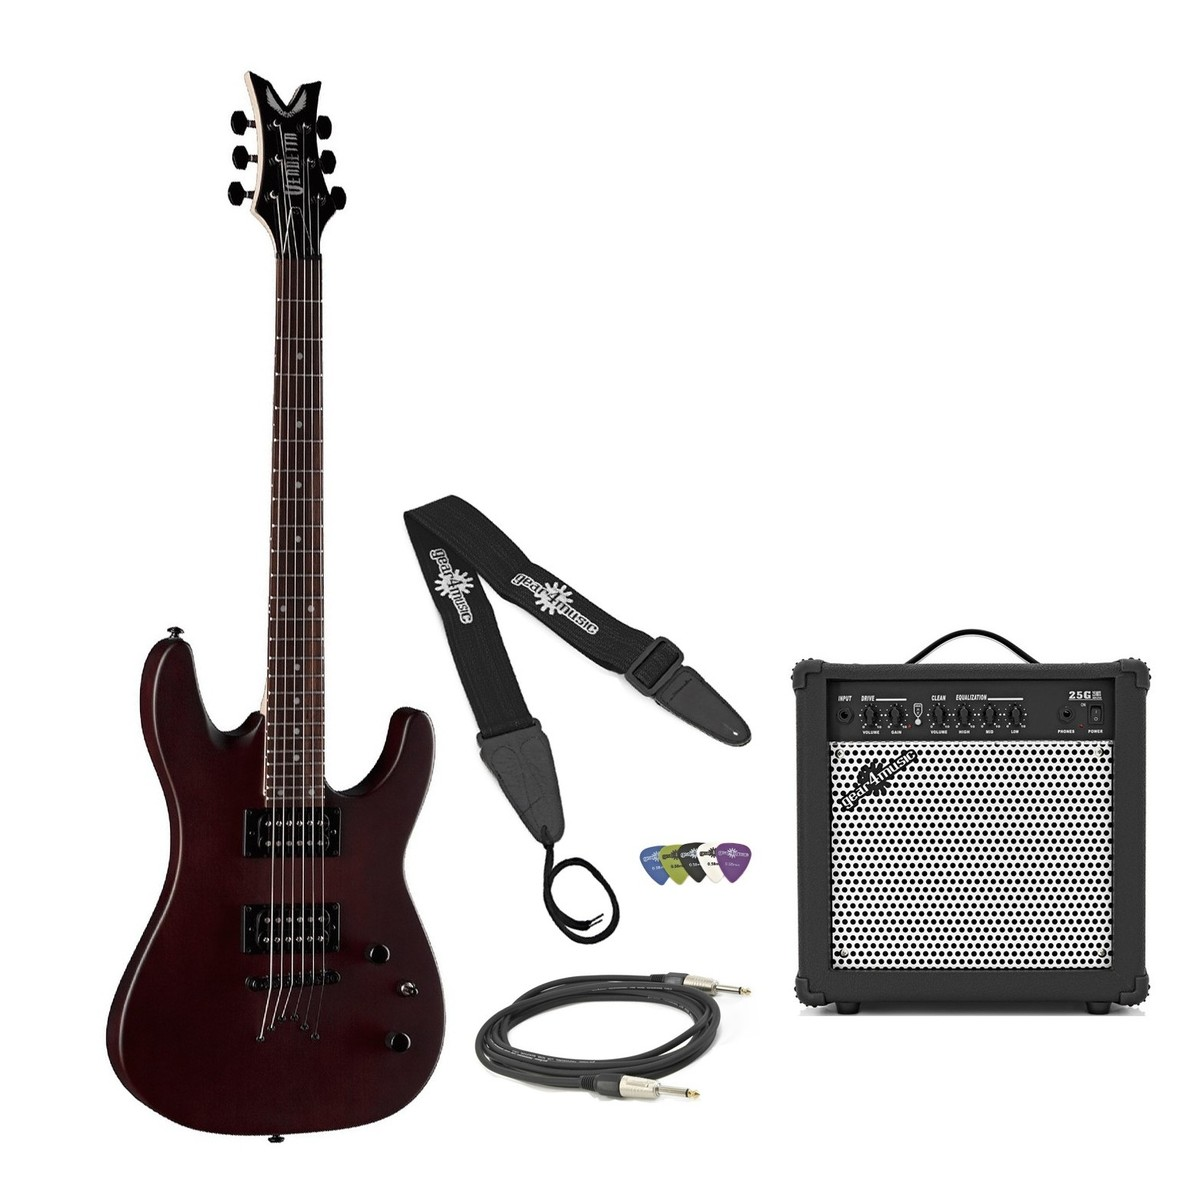 DISC Dean Vendetta XM Guitar Pack, Satin Natural Dean Vendetta Wiring Schematic For Guitar on